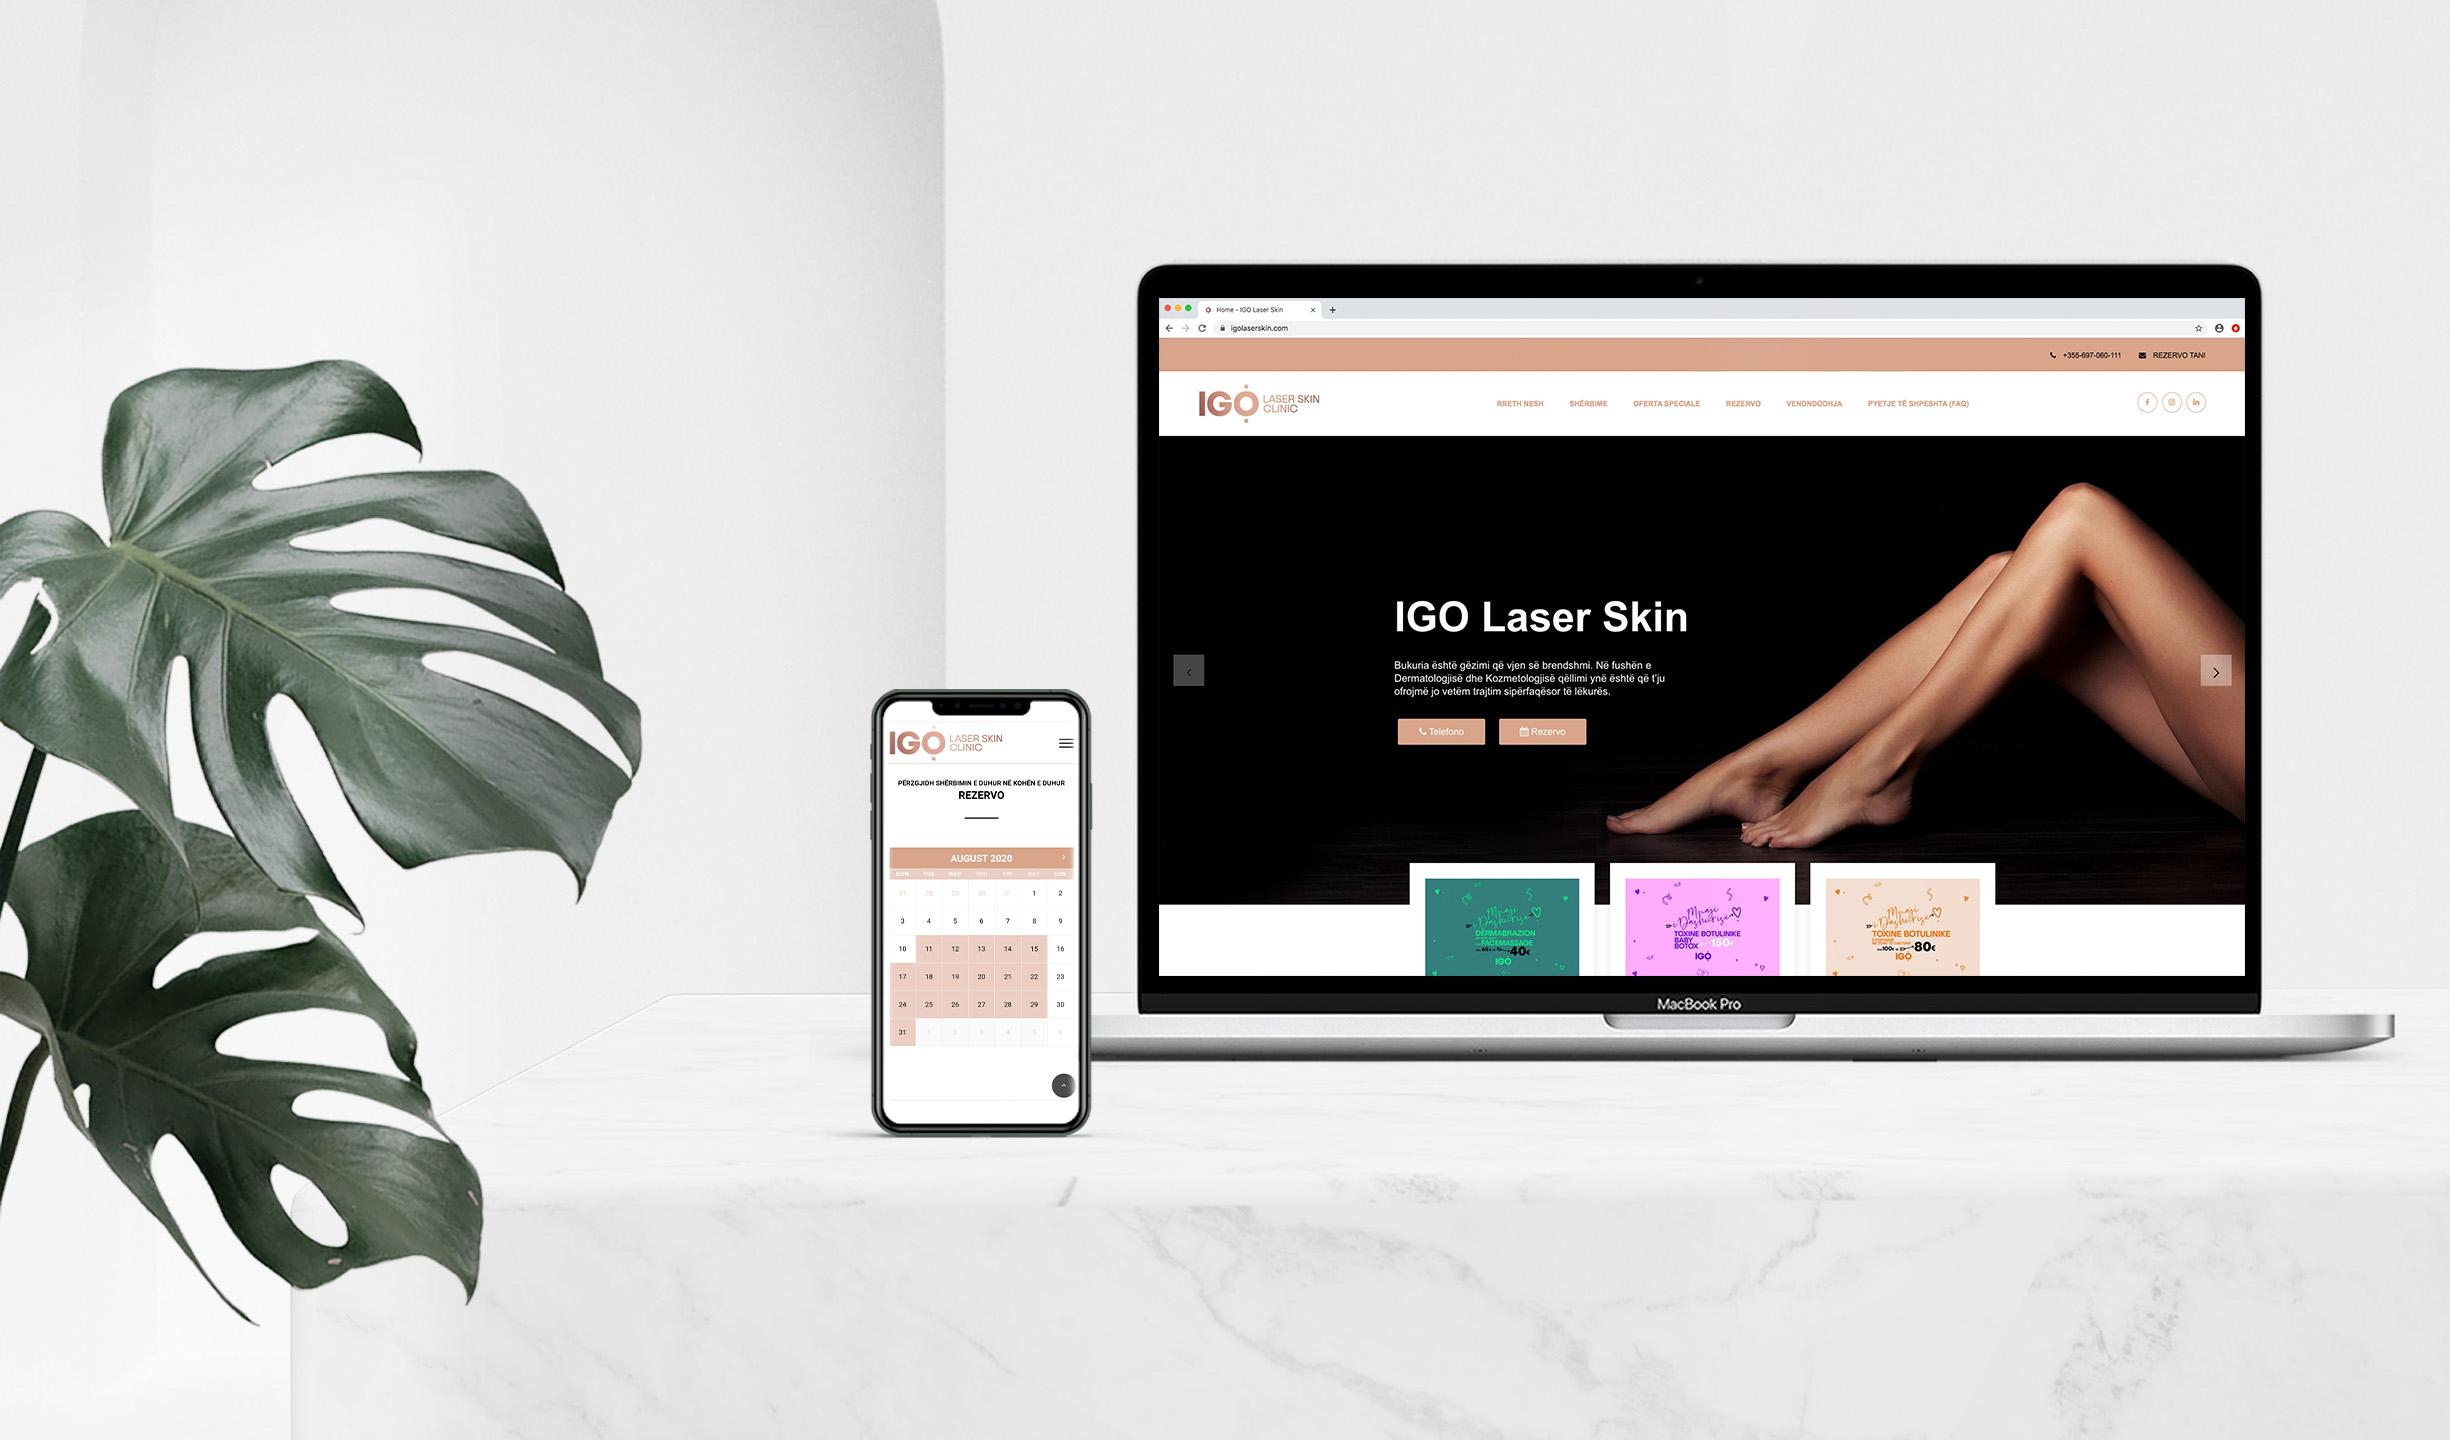 IGO Laser Skin Project Img 21 - Vatra Agency / Founder & CEO Gerton Bejo